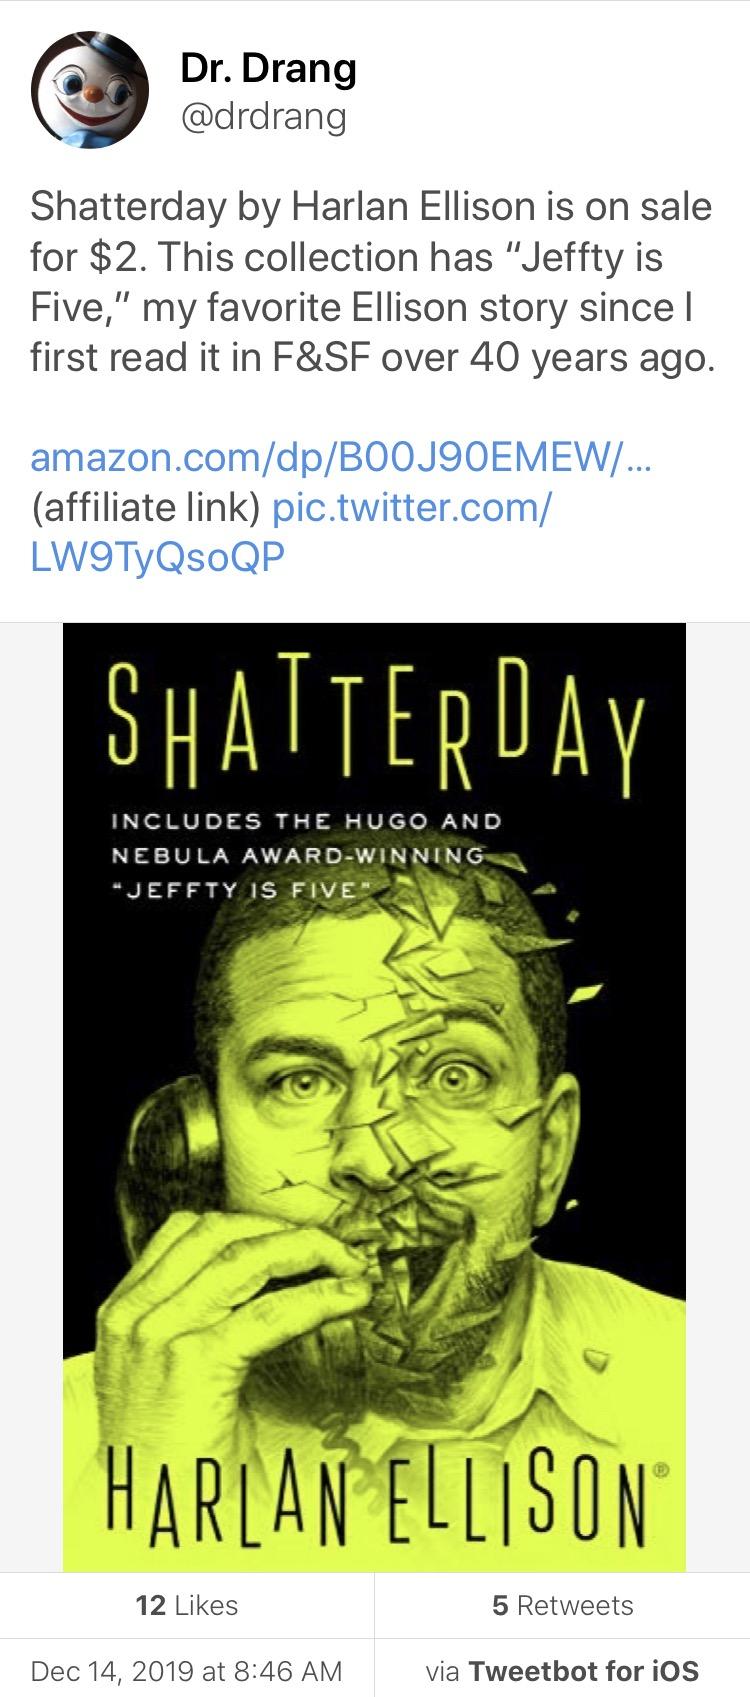 Shatterday tweet